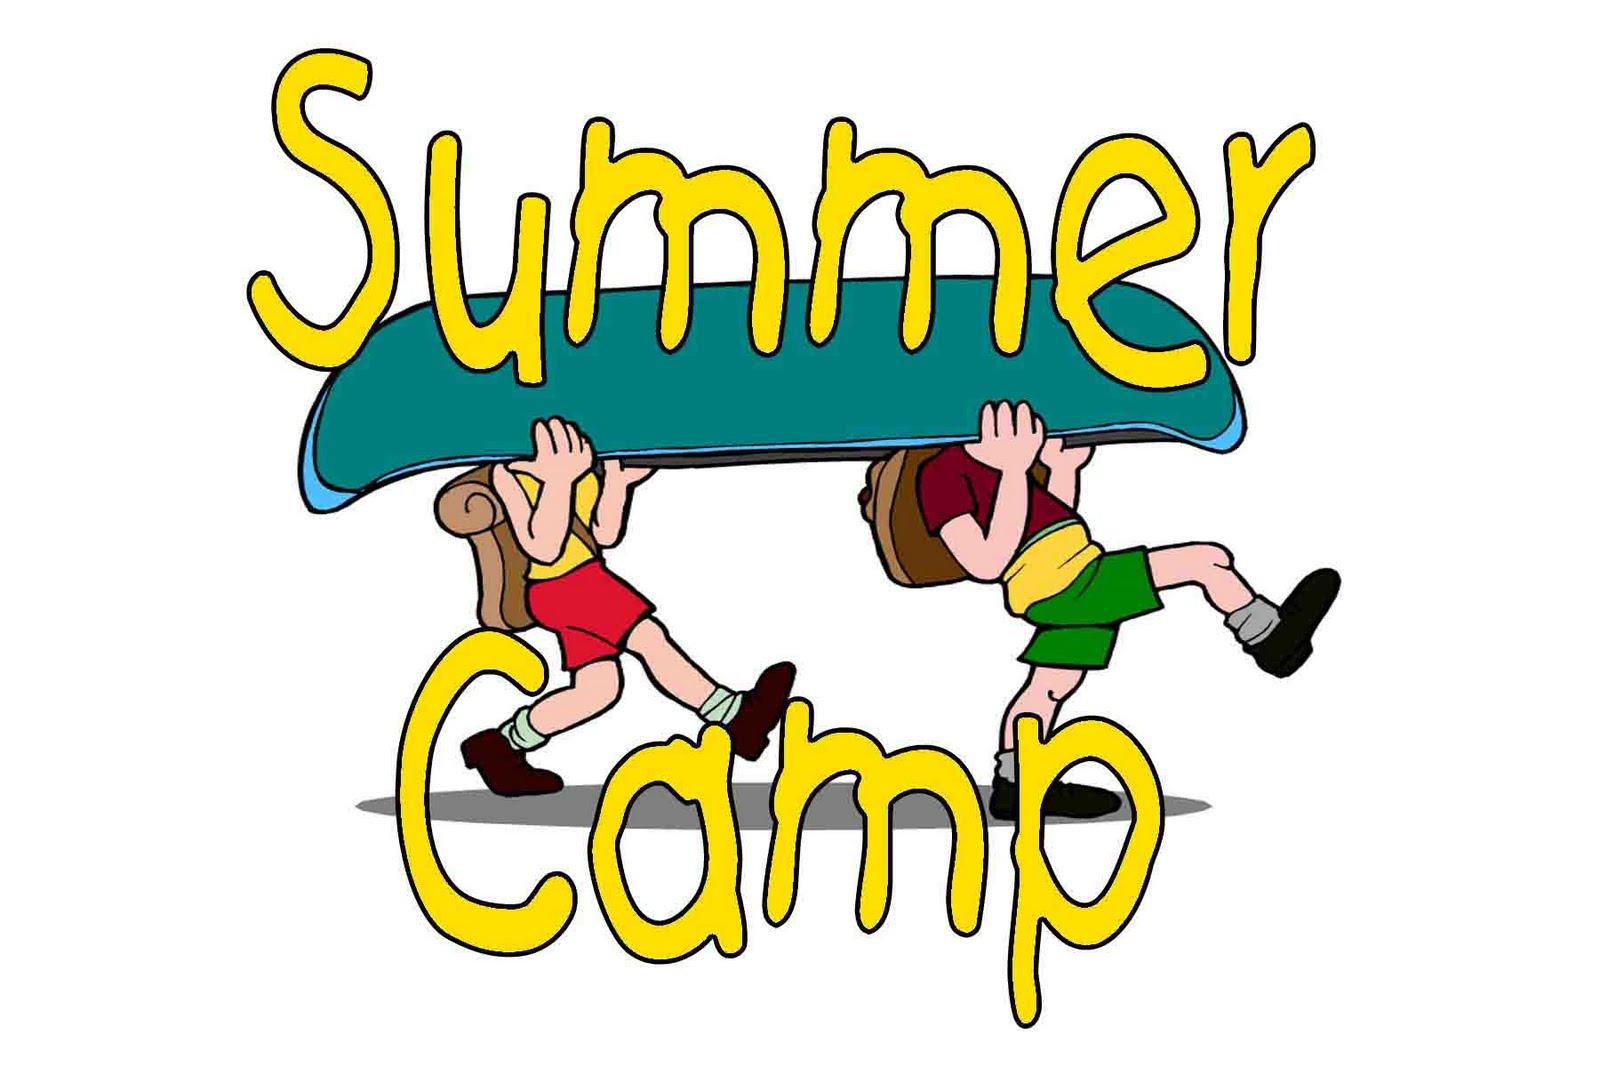 kids summer camp clipart clipart panda free clipart images rh clipartpanda com summer camp clipart black and white summer camp clipart images